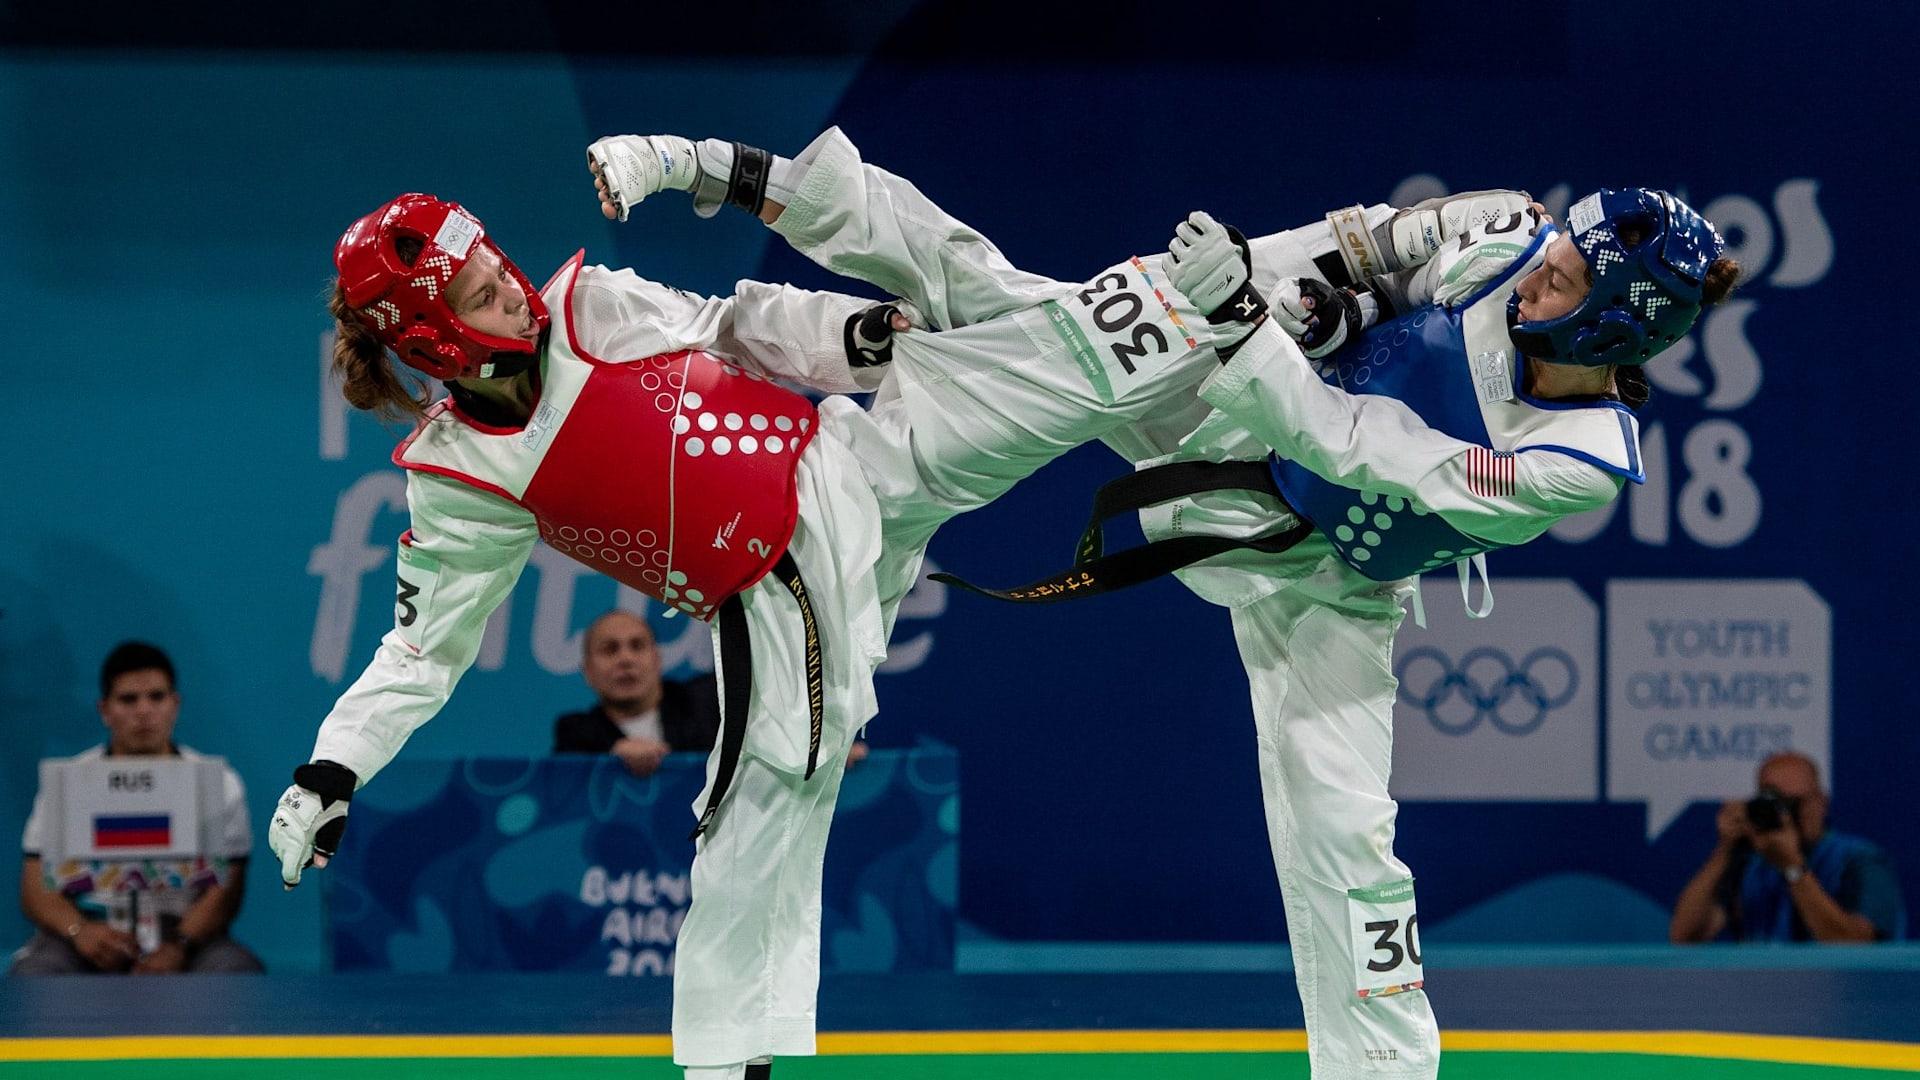 Taekwondo and badminton teams announced, Australian Olympic